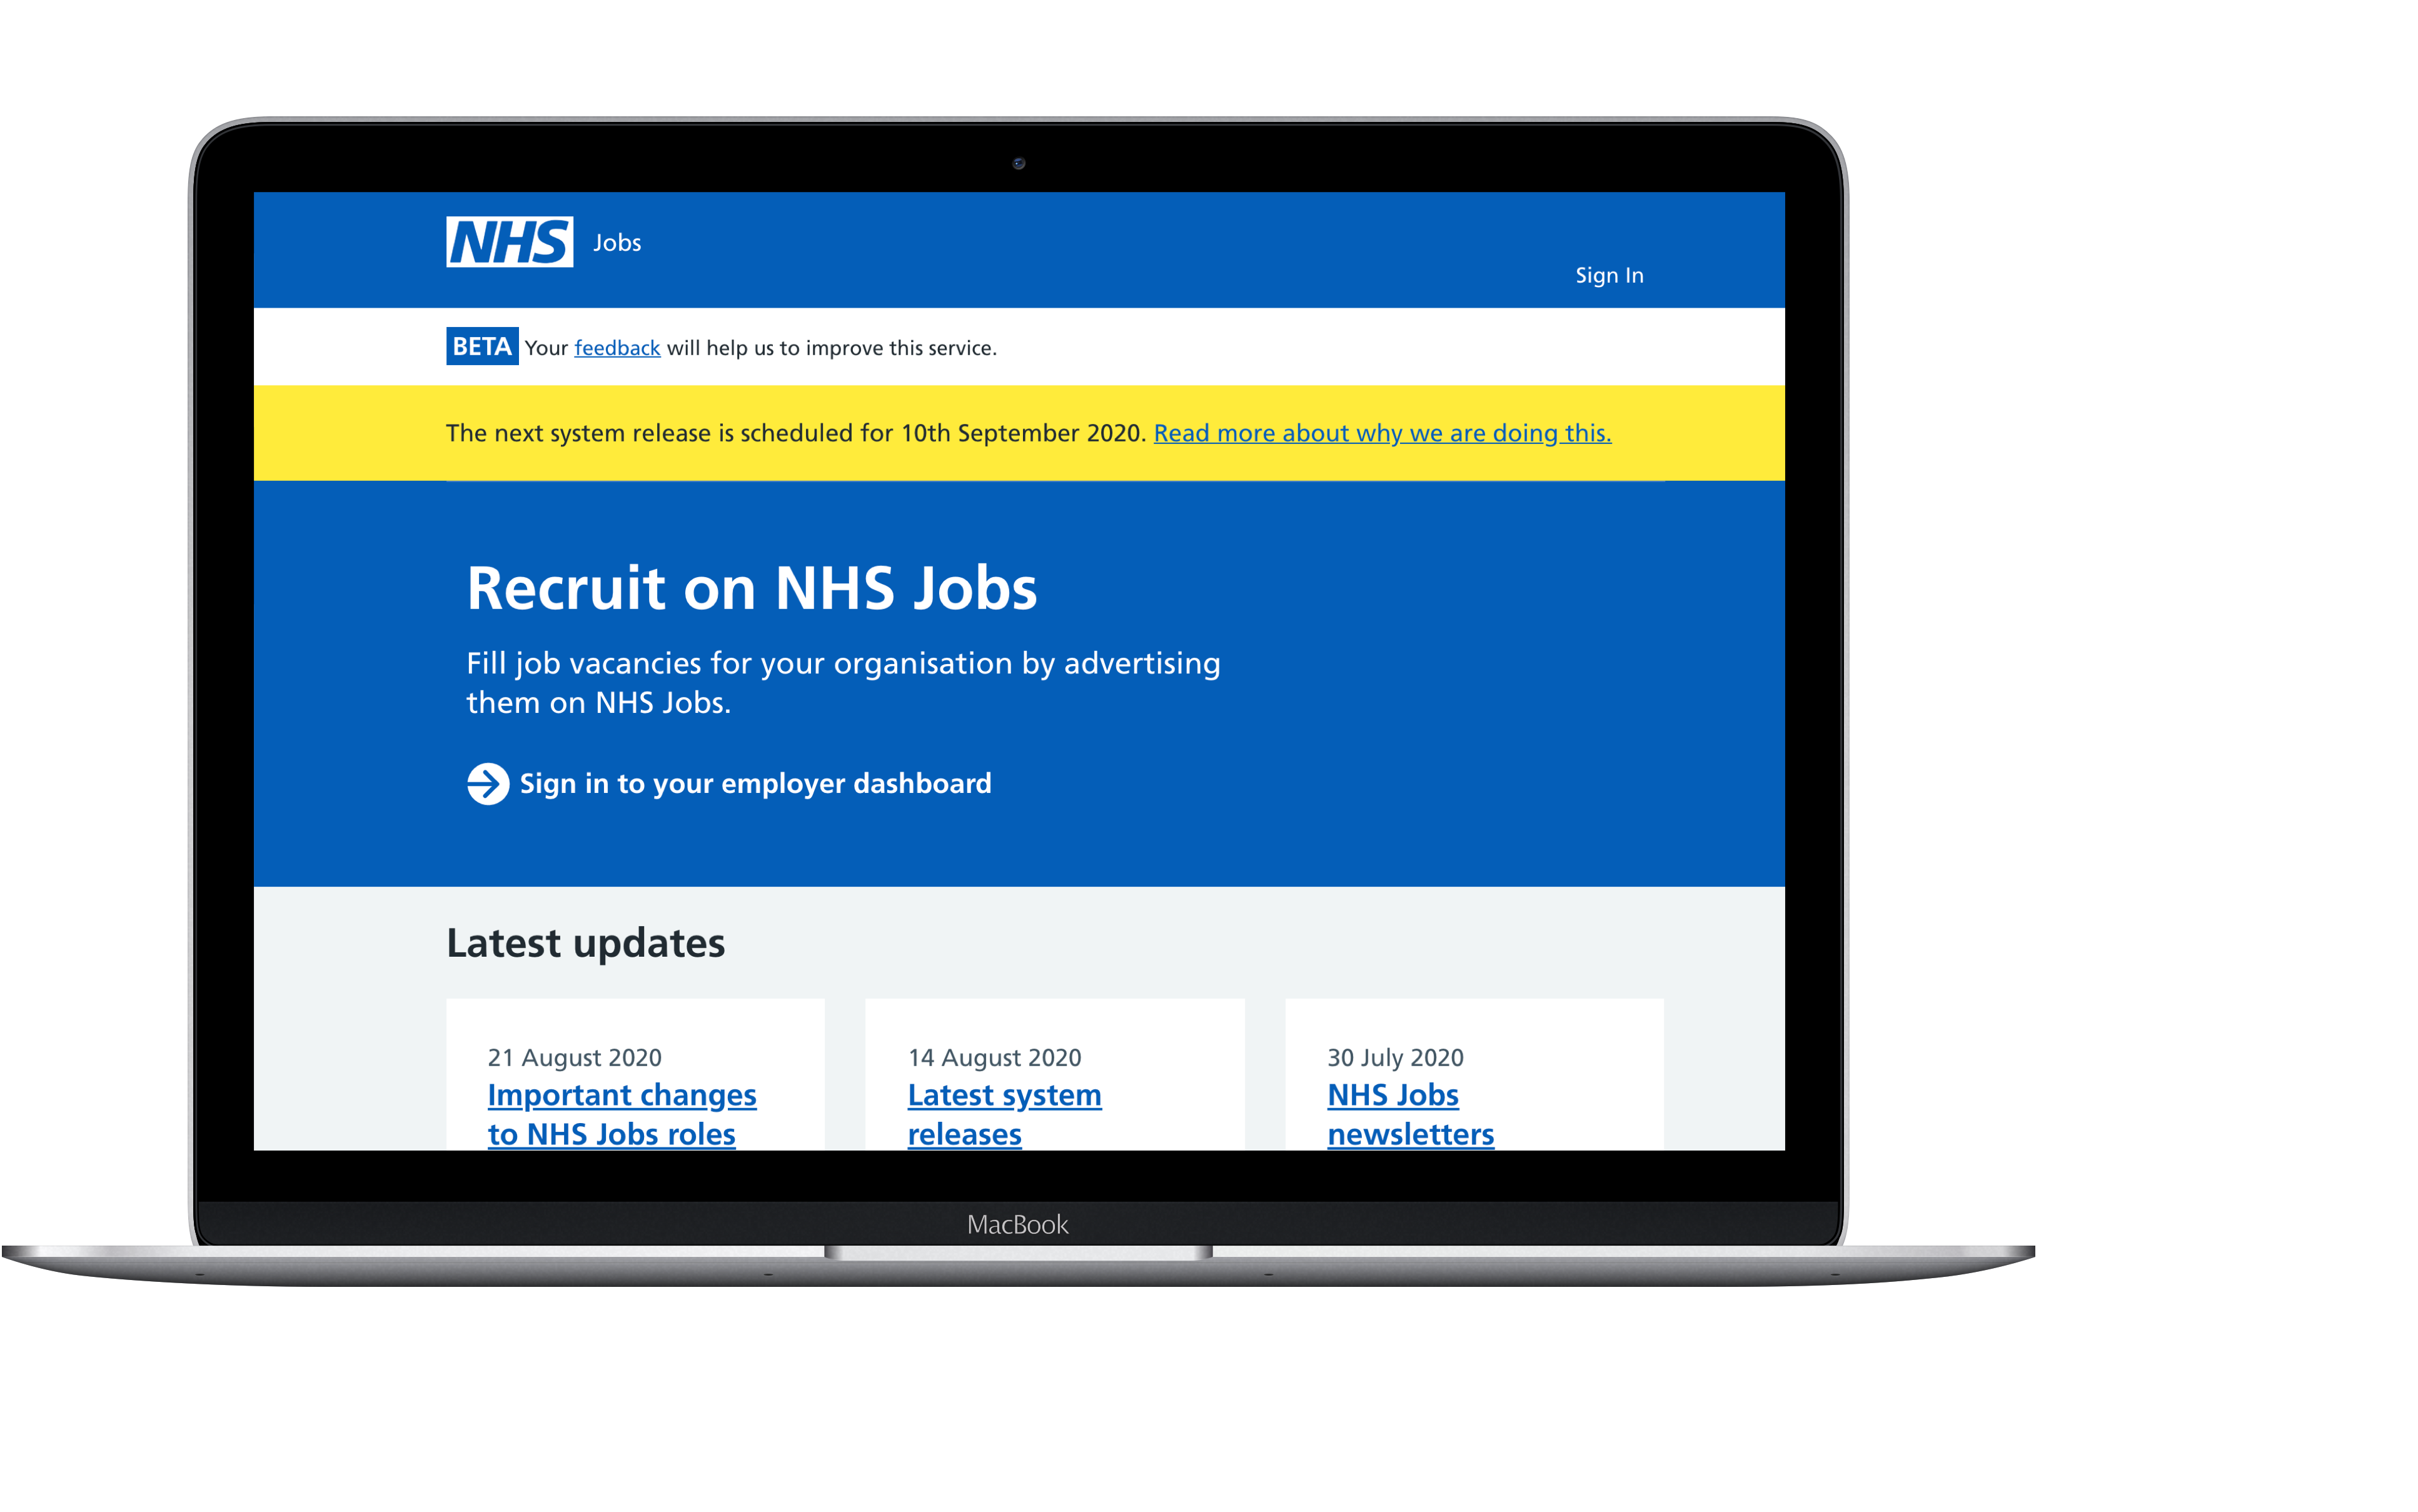 Recruit on NHS jobs laptop